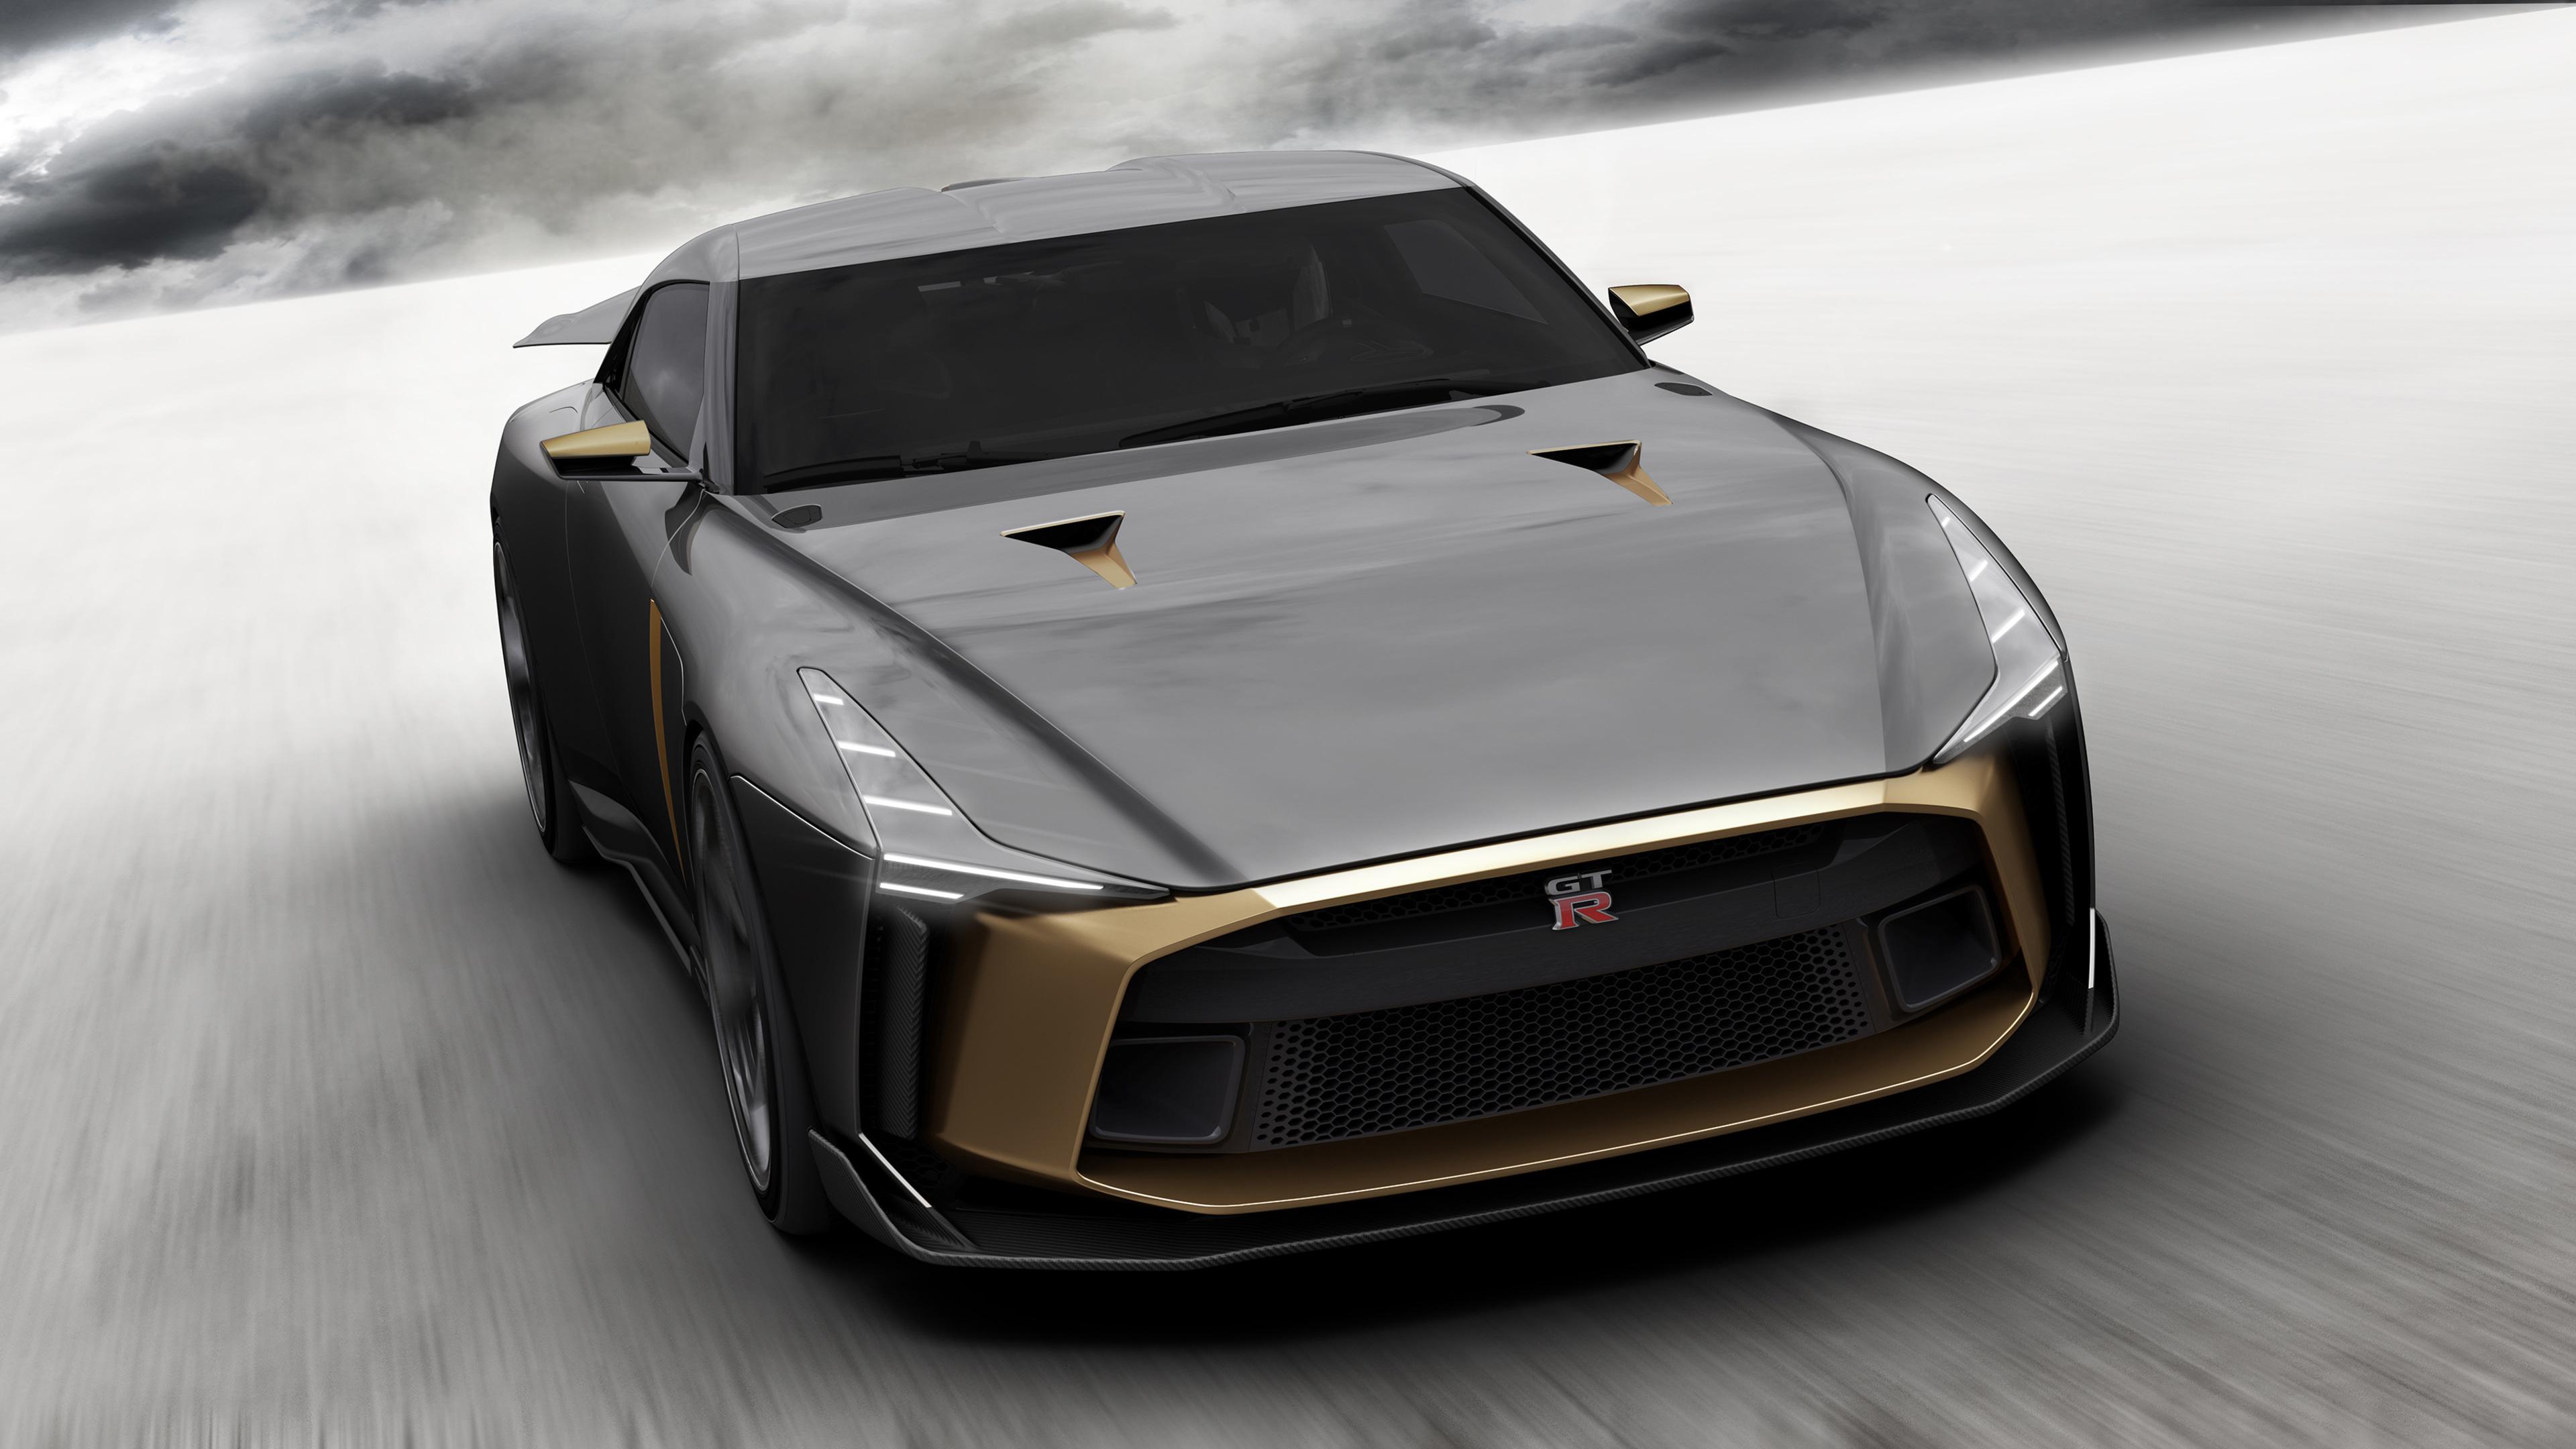 nissan gt r50 concept 2018 4k 1539112042 - Nissan GT R50 Concept 2018 4k - nissan wallpapers, nissan gt r50 wallpapers, hd-wallpapers, concept cars wallpapers, 4k-wallpapers, 2018 cars wallpapers